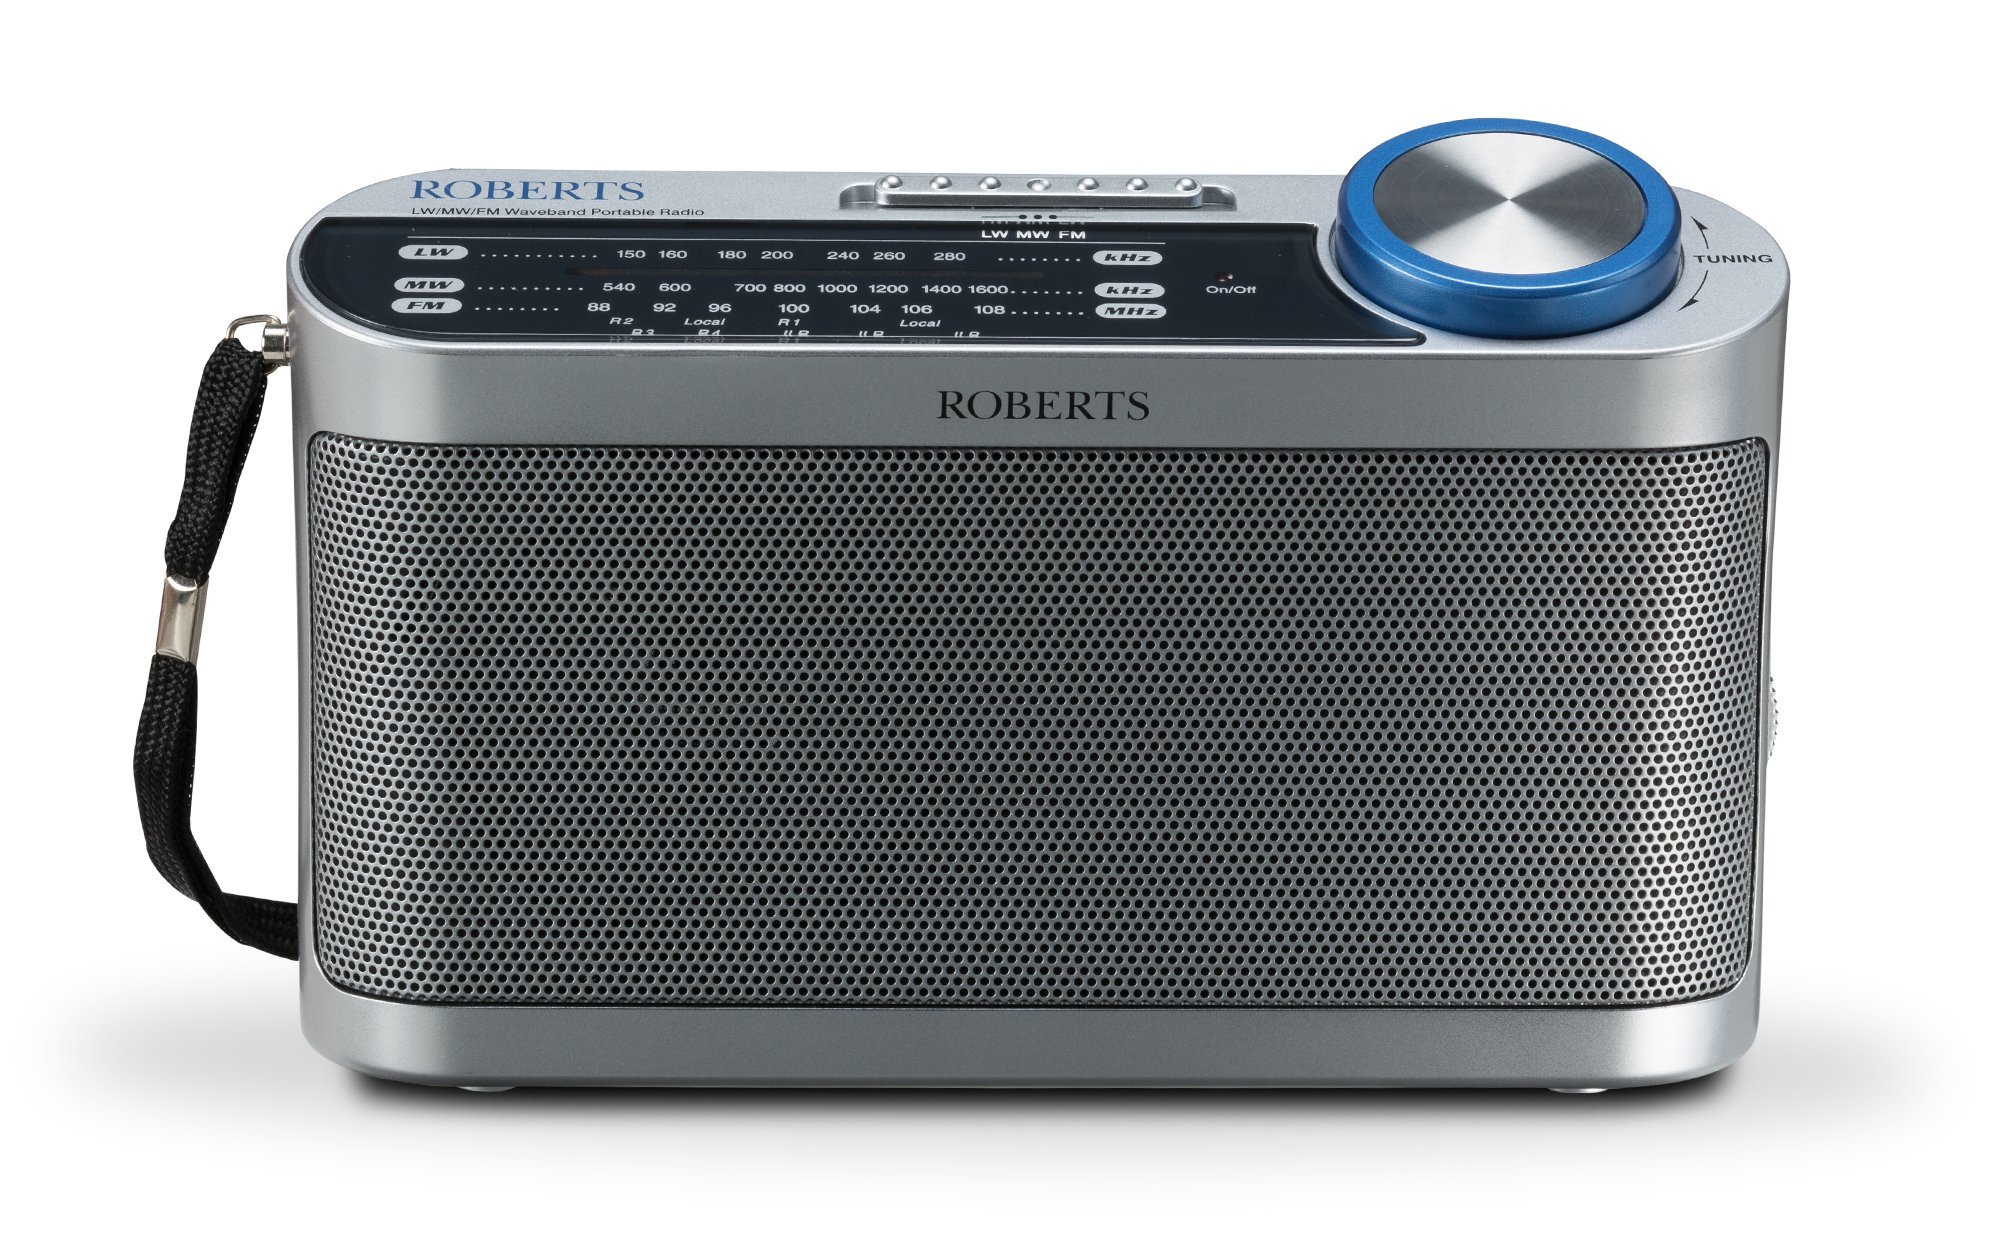 Roberts Radio R9993 Portable LW/MW/FM Radio with Headphone Socket 4